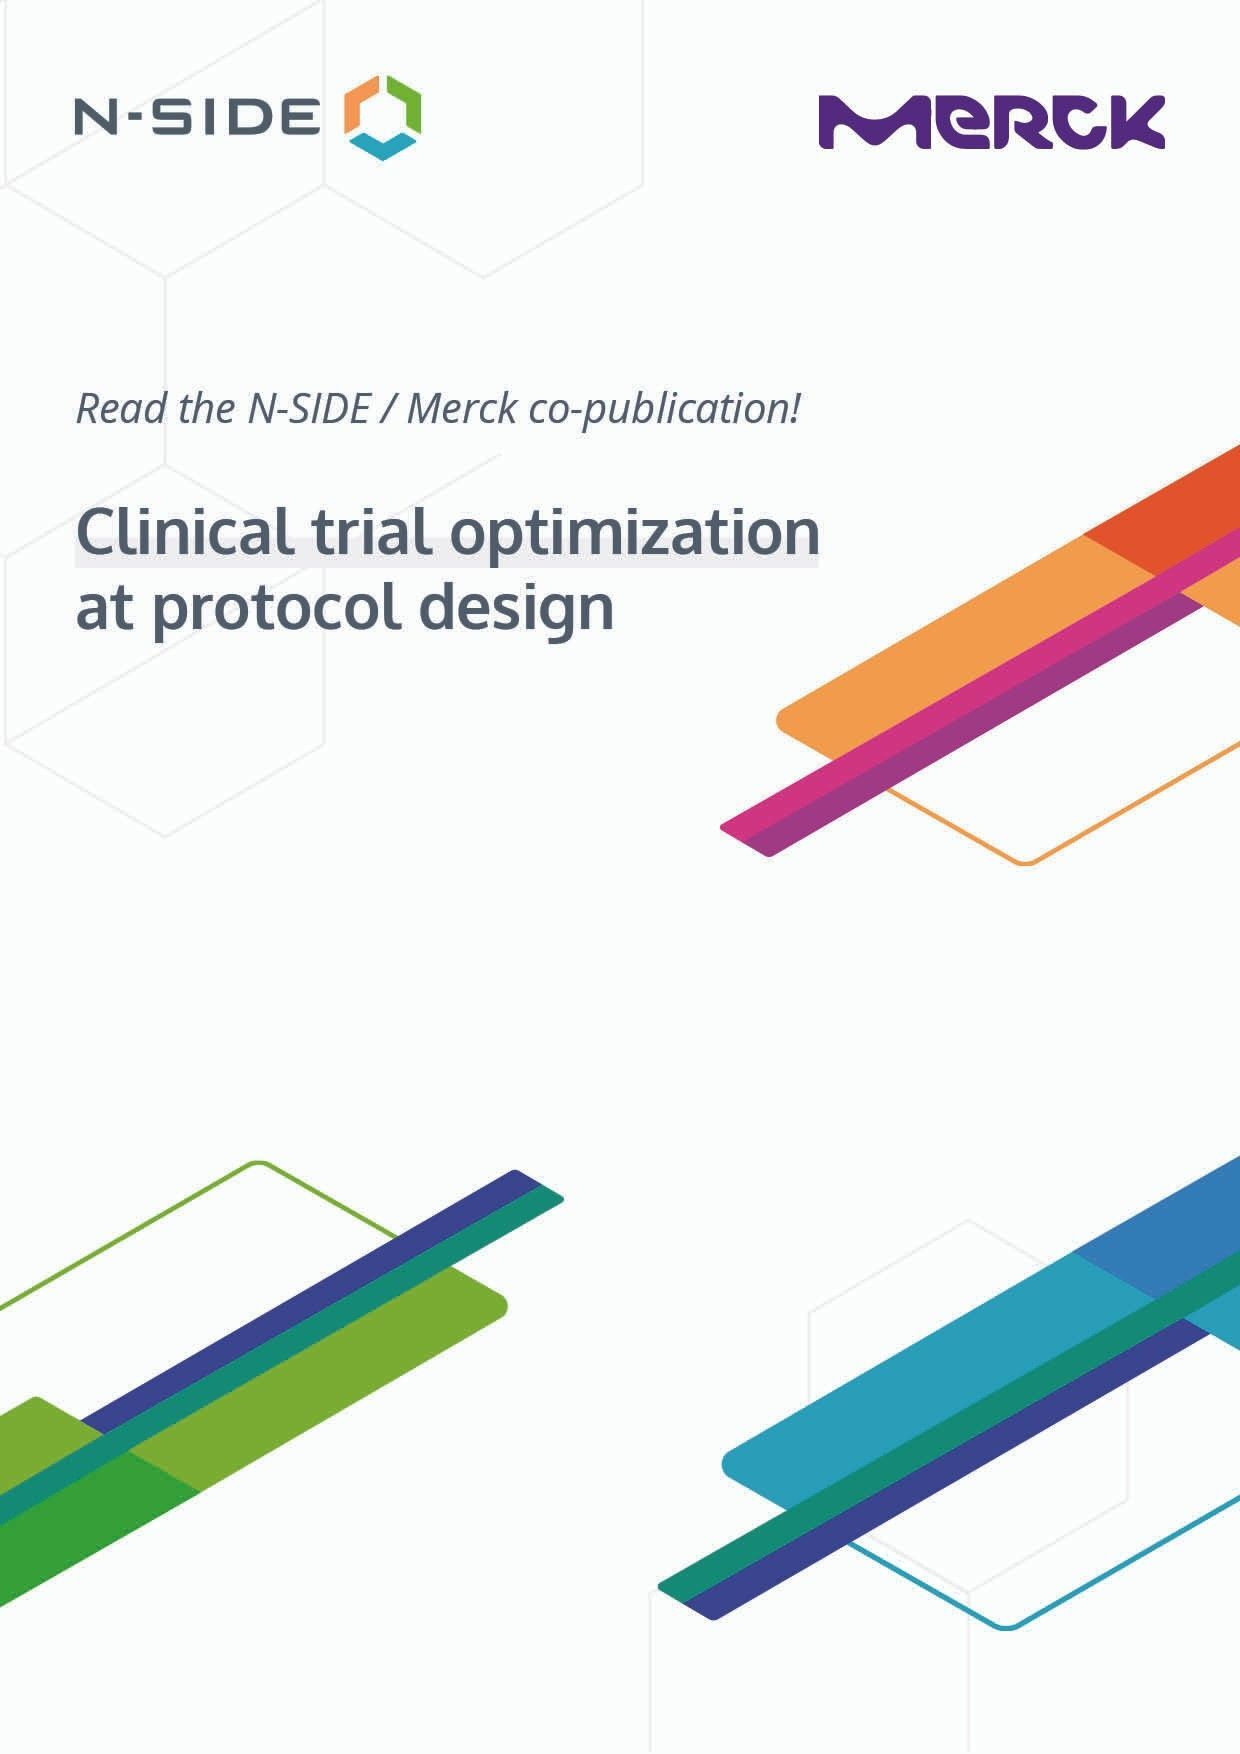 Clinical trial optimization